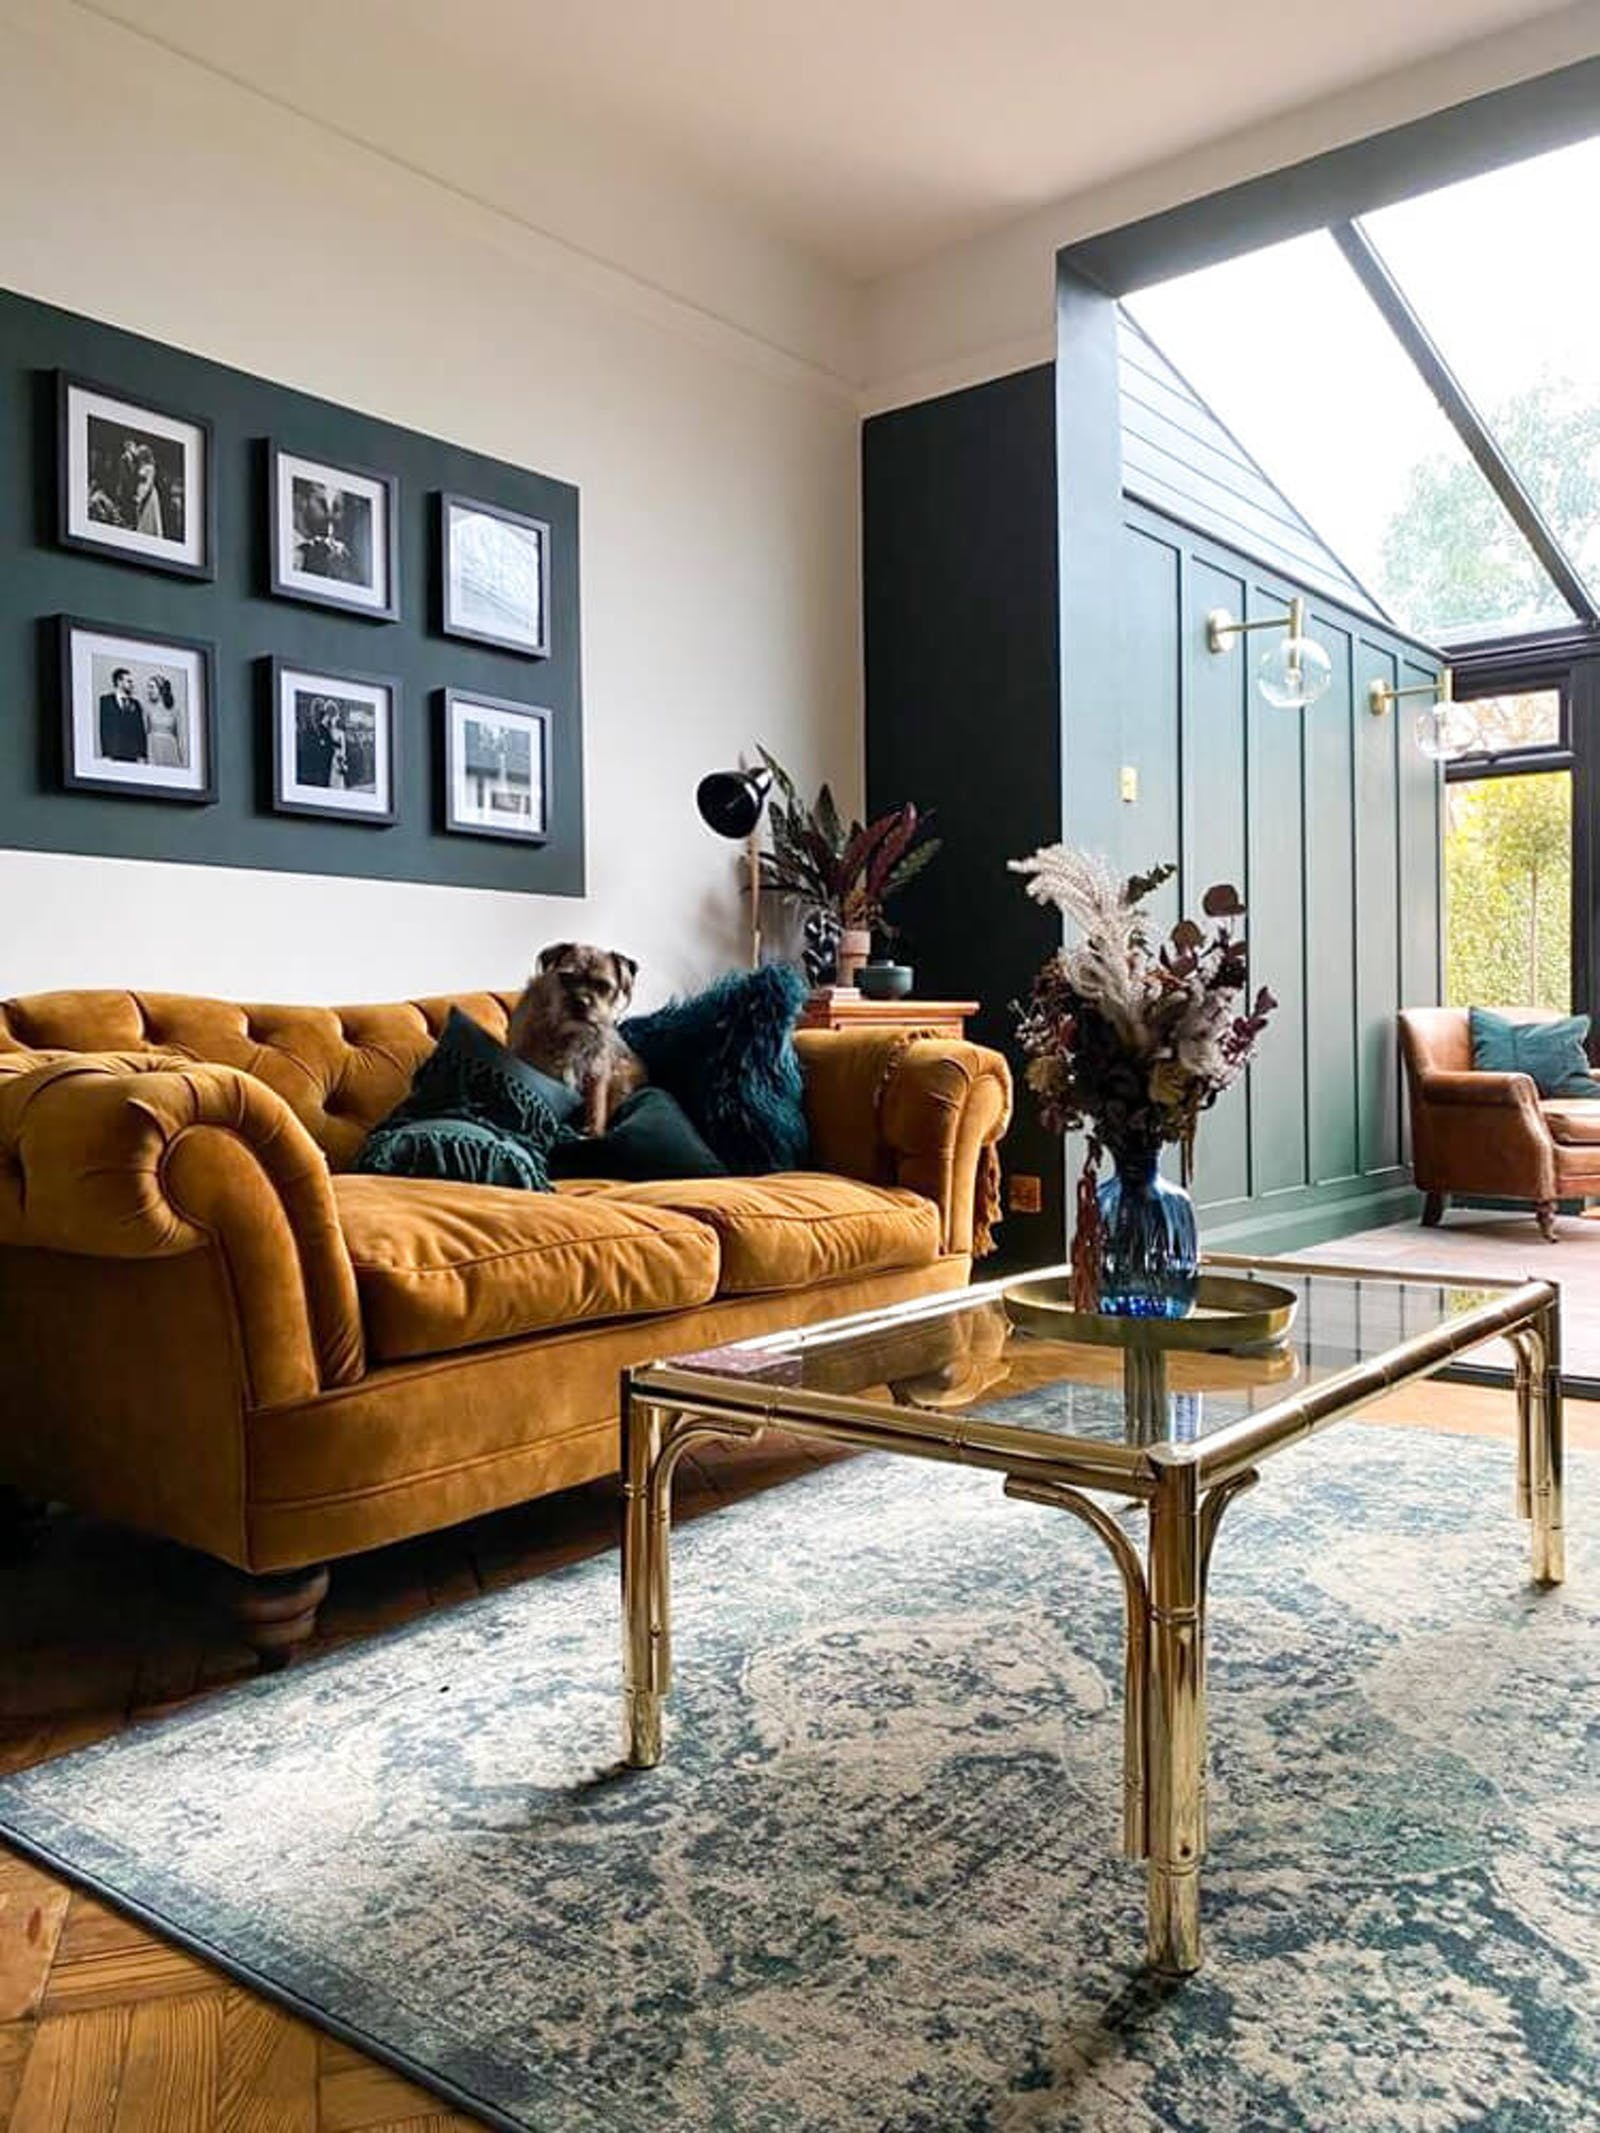 Open plan living room with dark mustard sofa